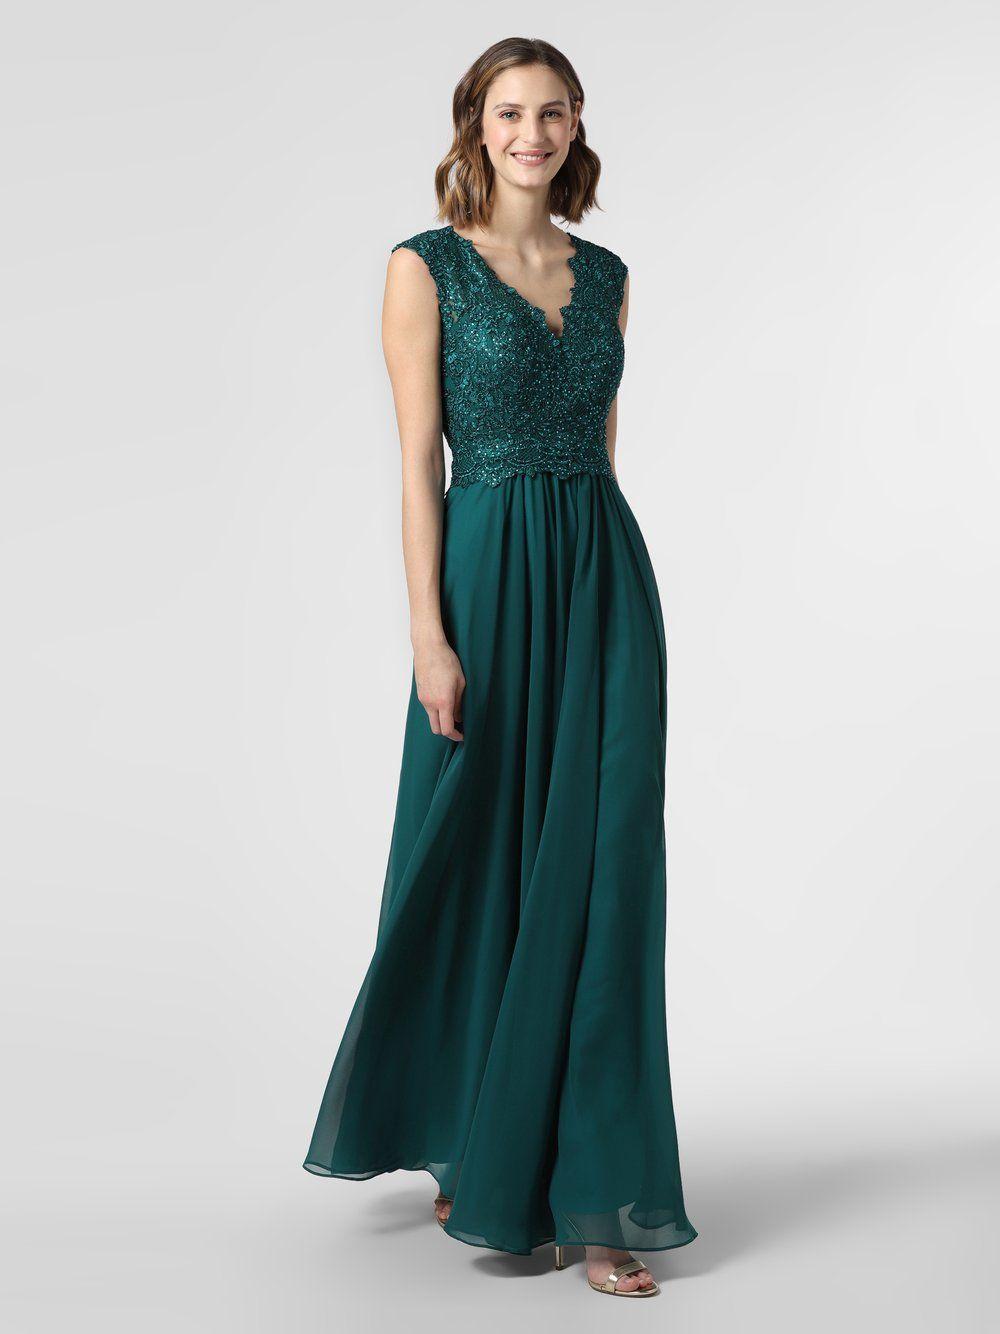 Luxuar Fashion Abendkleid grün in 9  Luxuar fashion